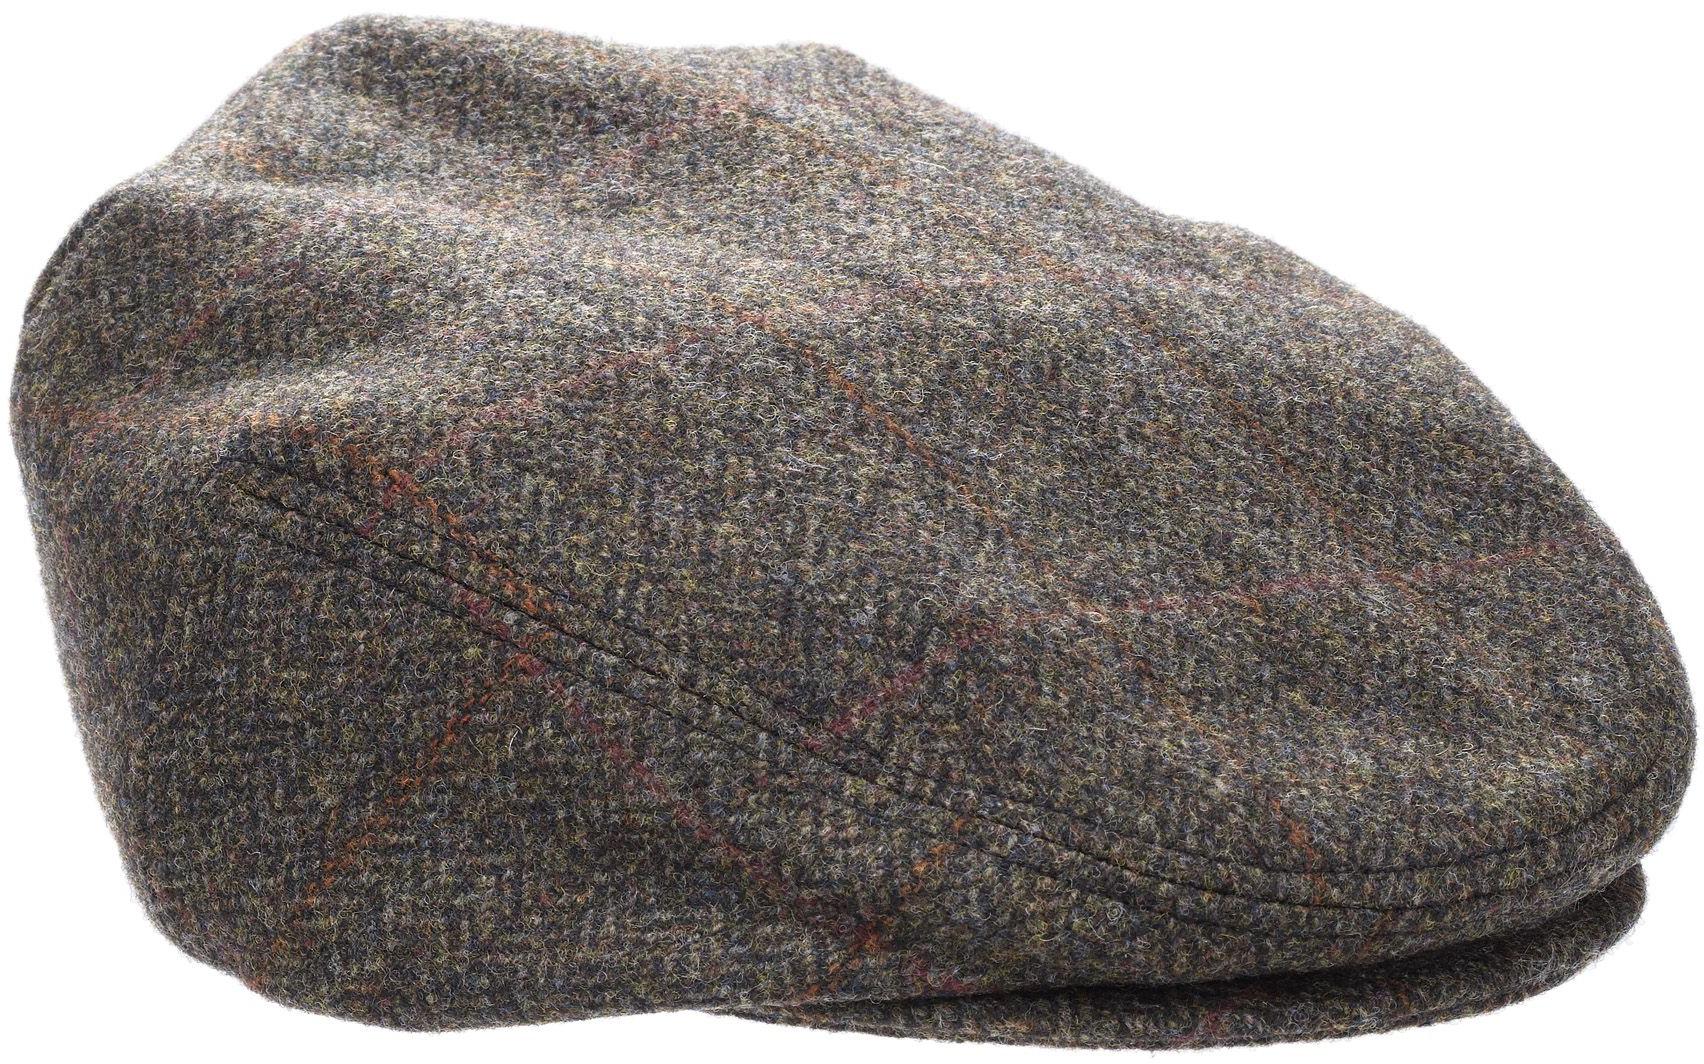 vamos-usar-chapeu-masculino-estilo-alexandre-taleb (6) 5e27f98fff2